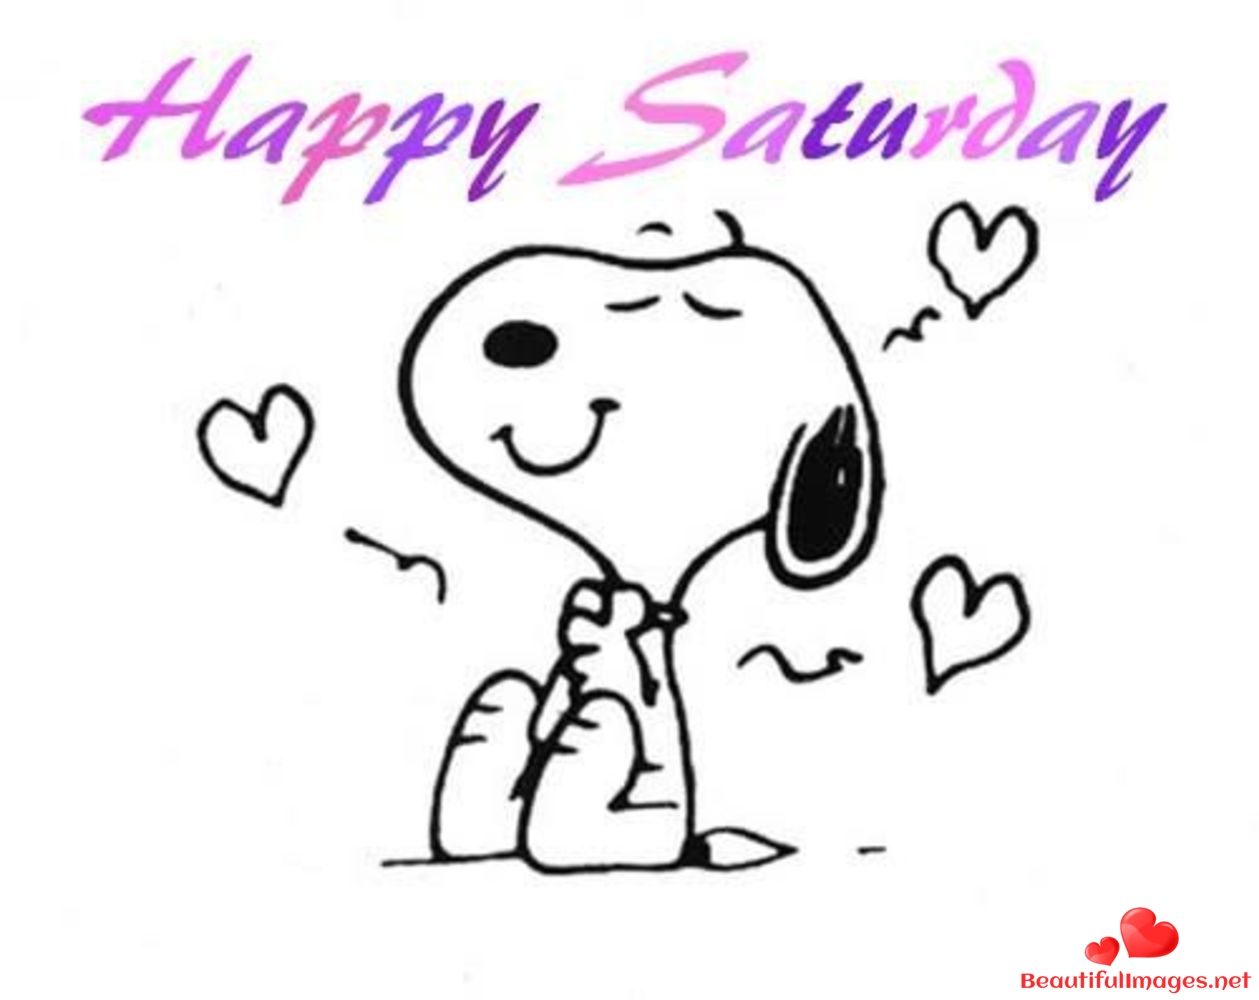 Good-morning-happy-saturday-facebook-whatsapp-images-nice-721